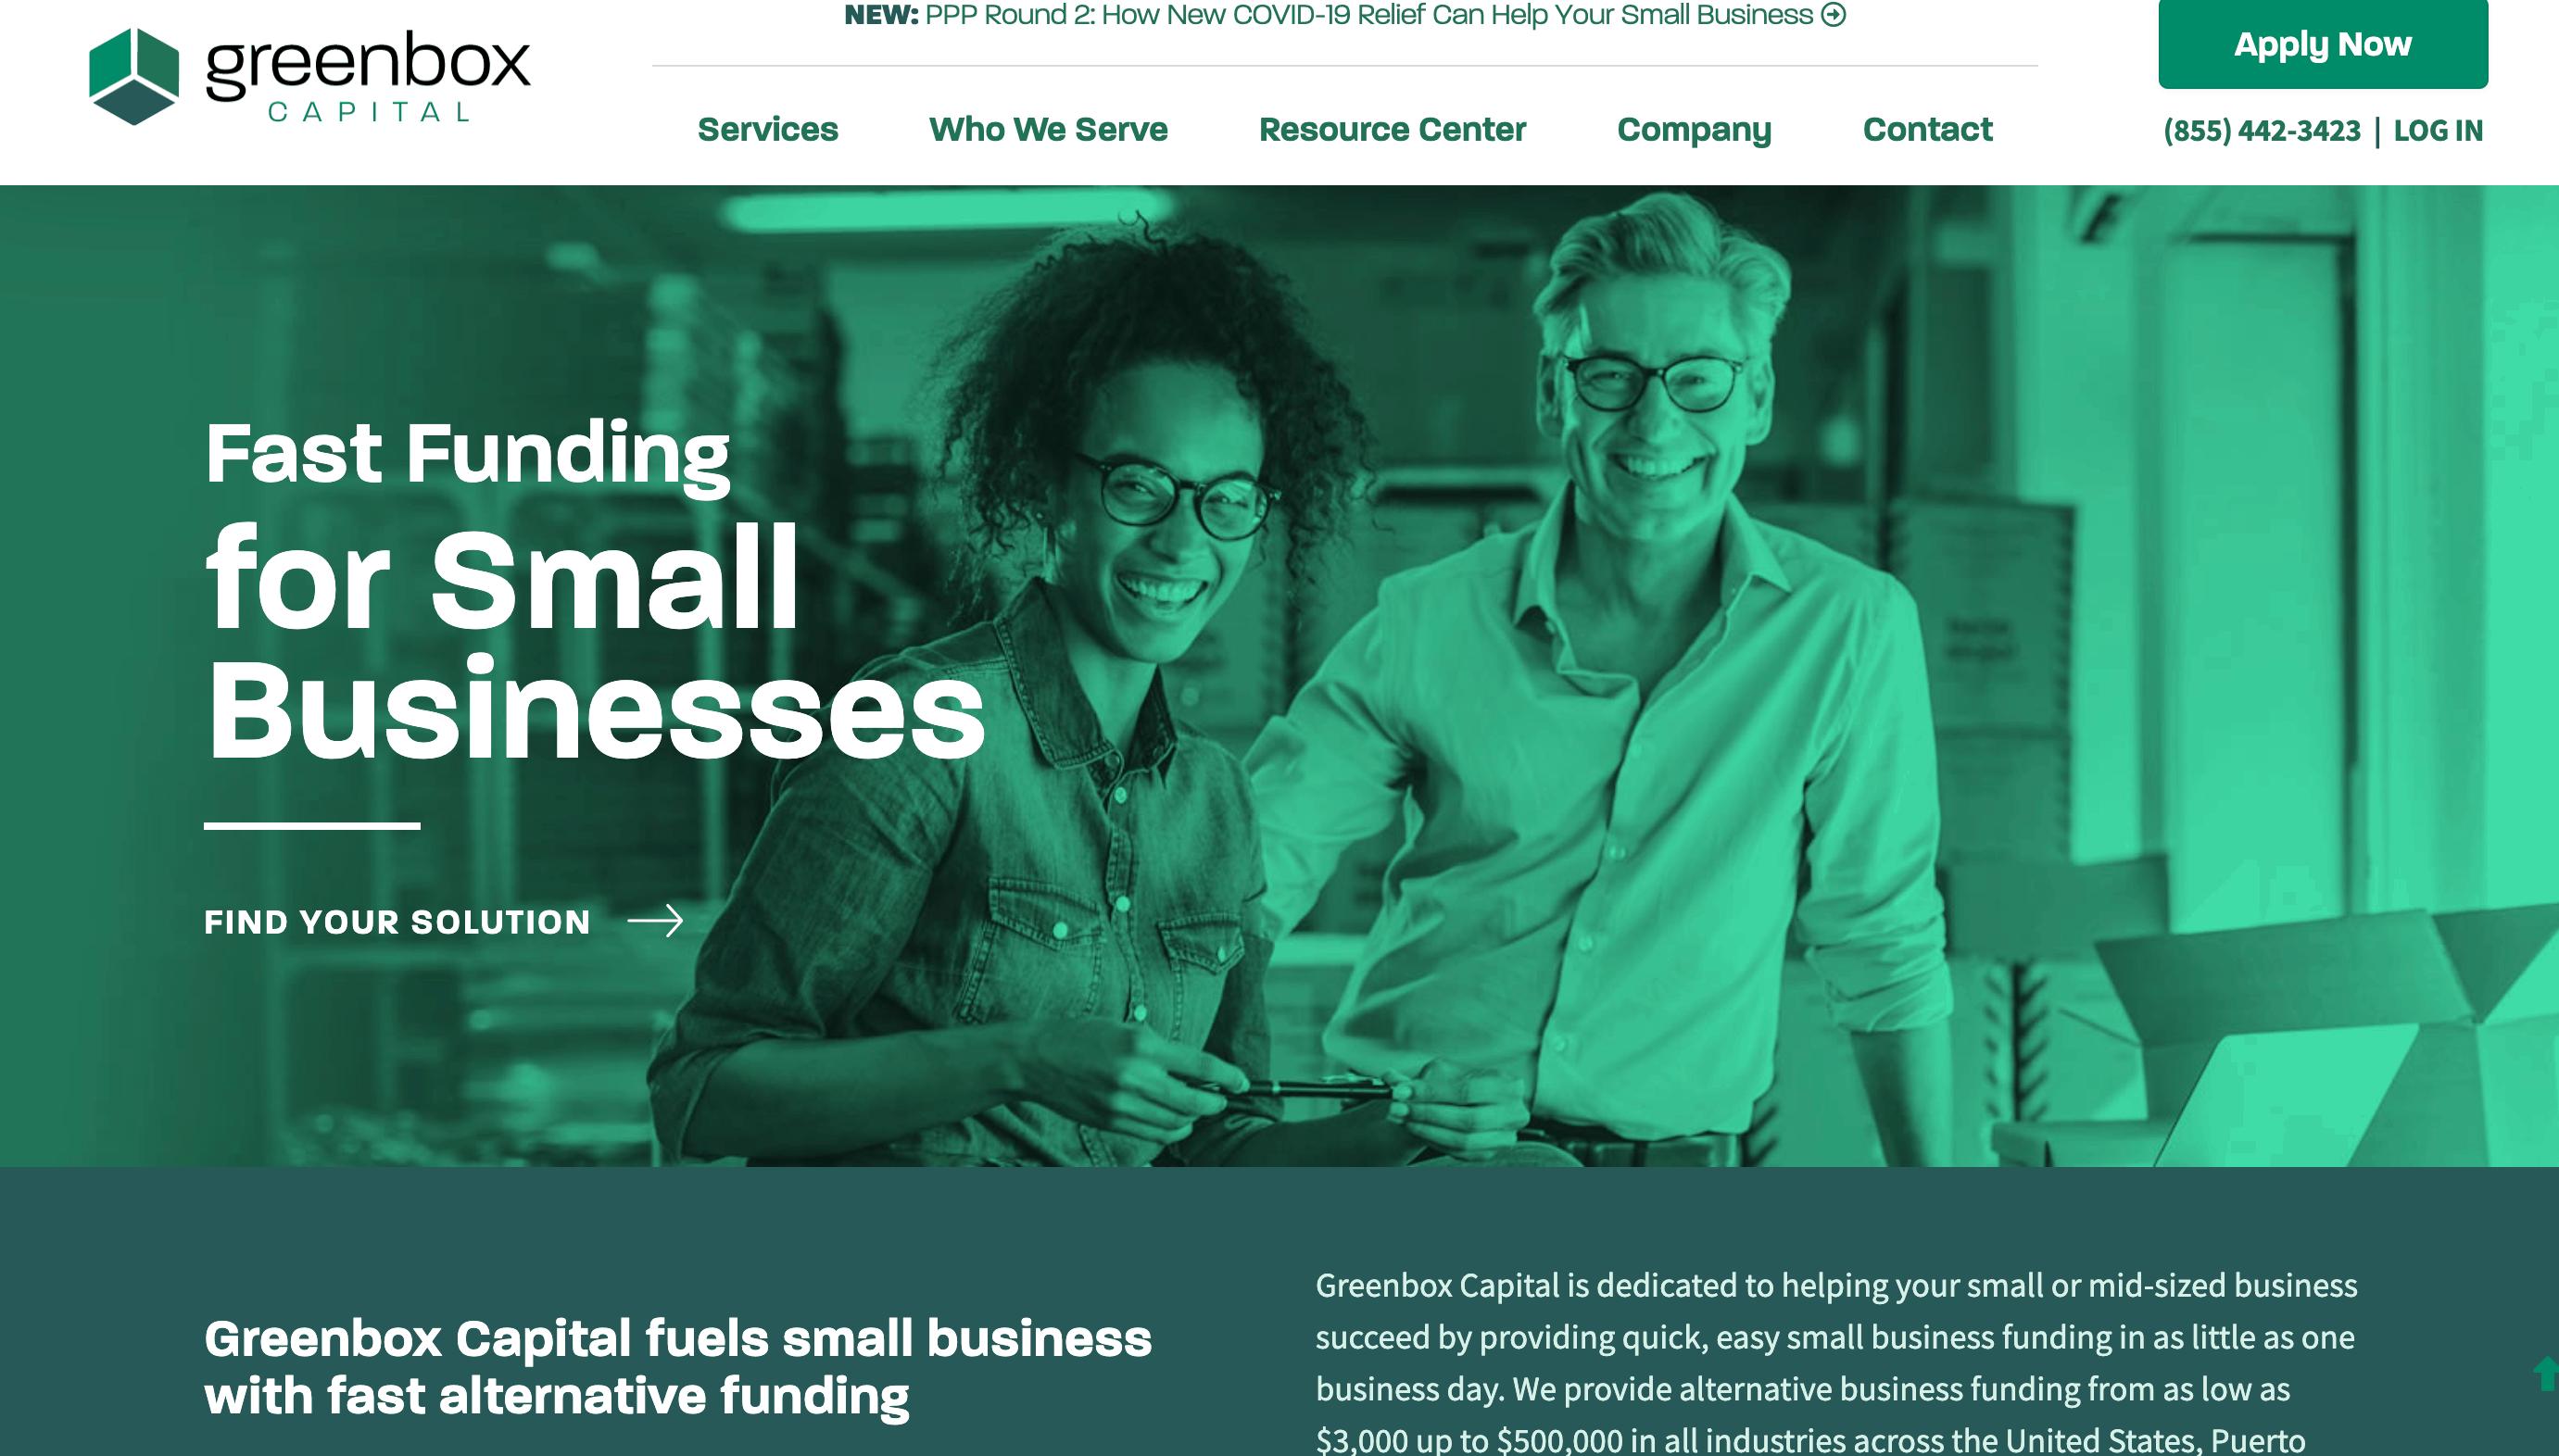 greenbox capital website homepage